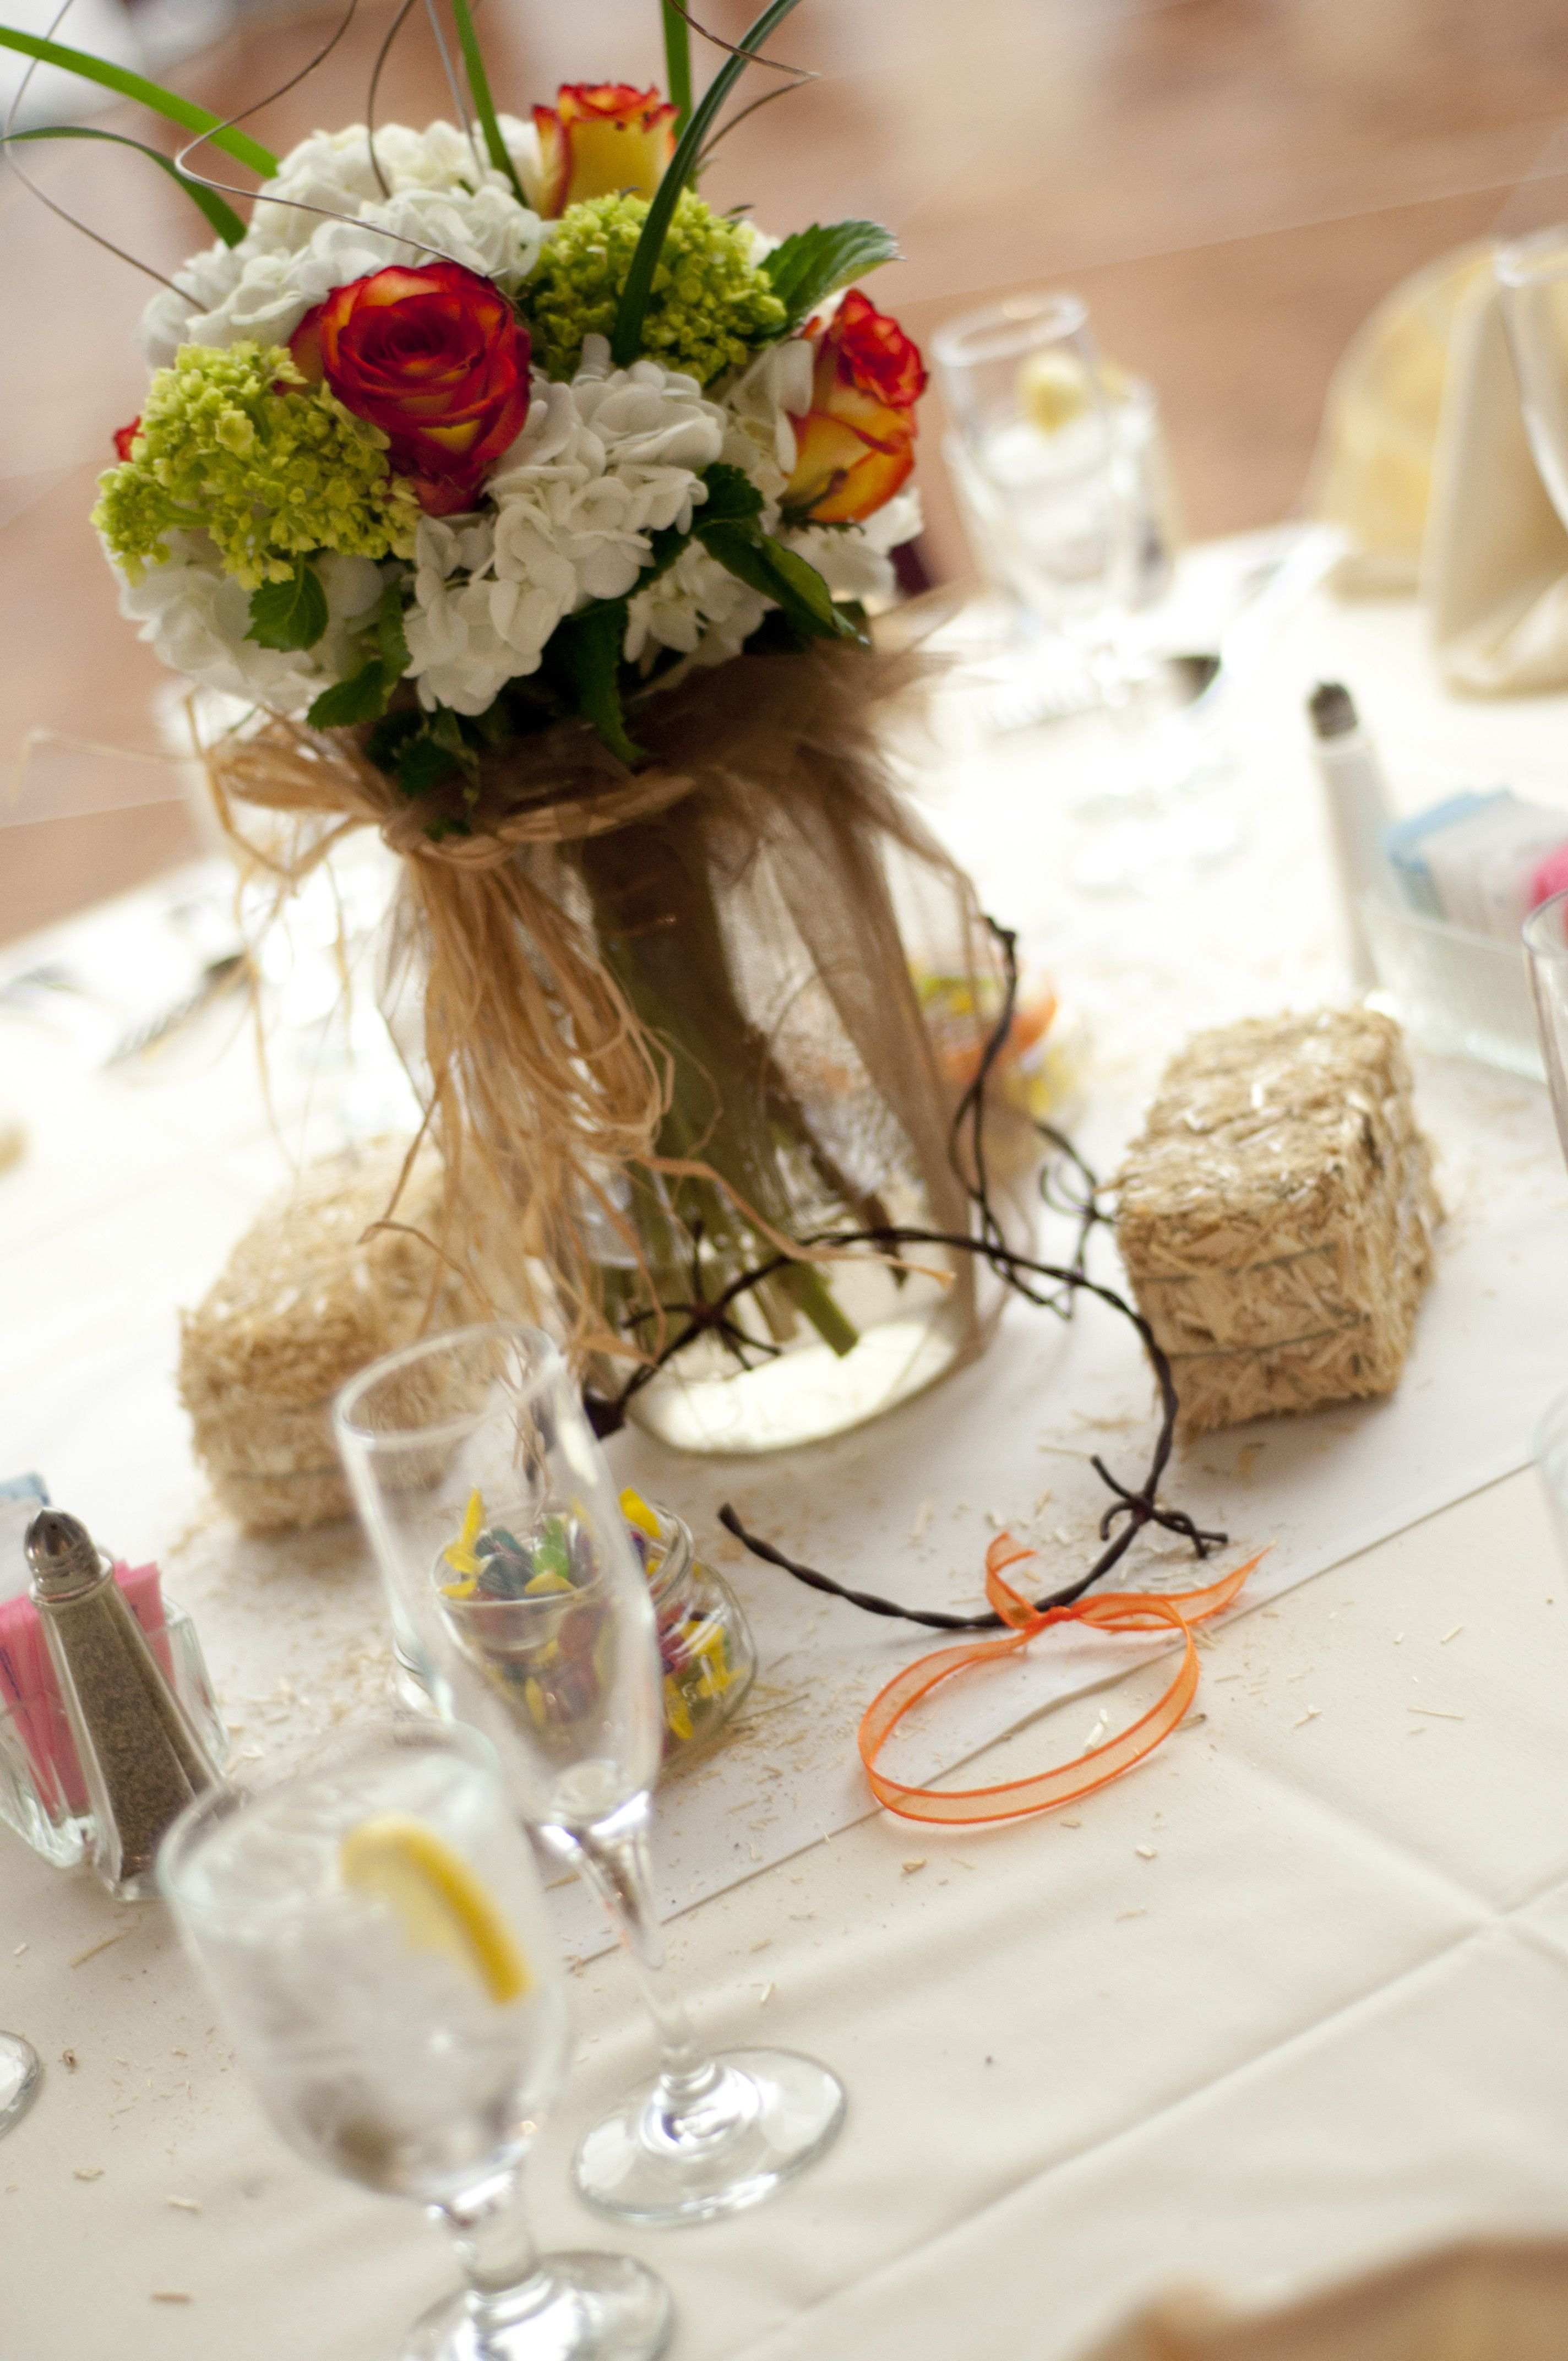 western wedding table decorations. Black Bedroom Furniture Sets. Home Design Ideas